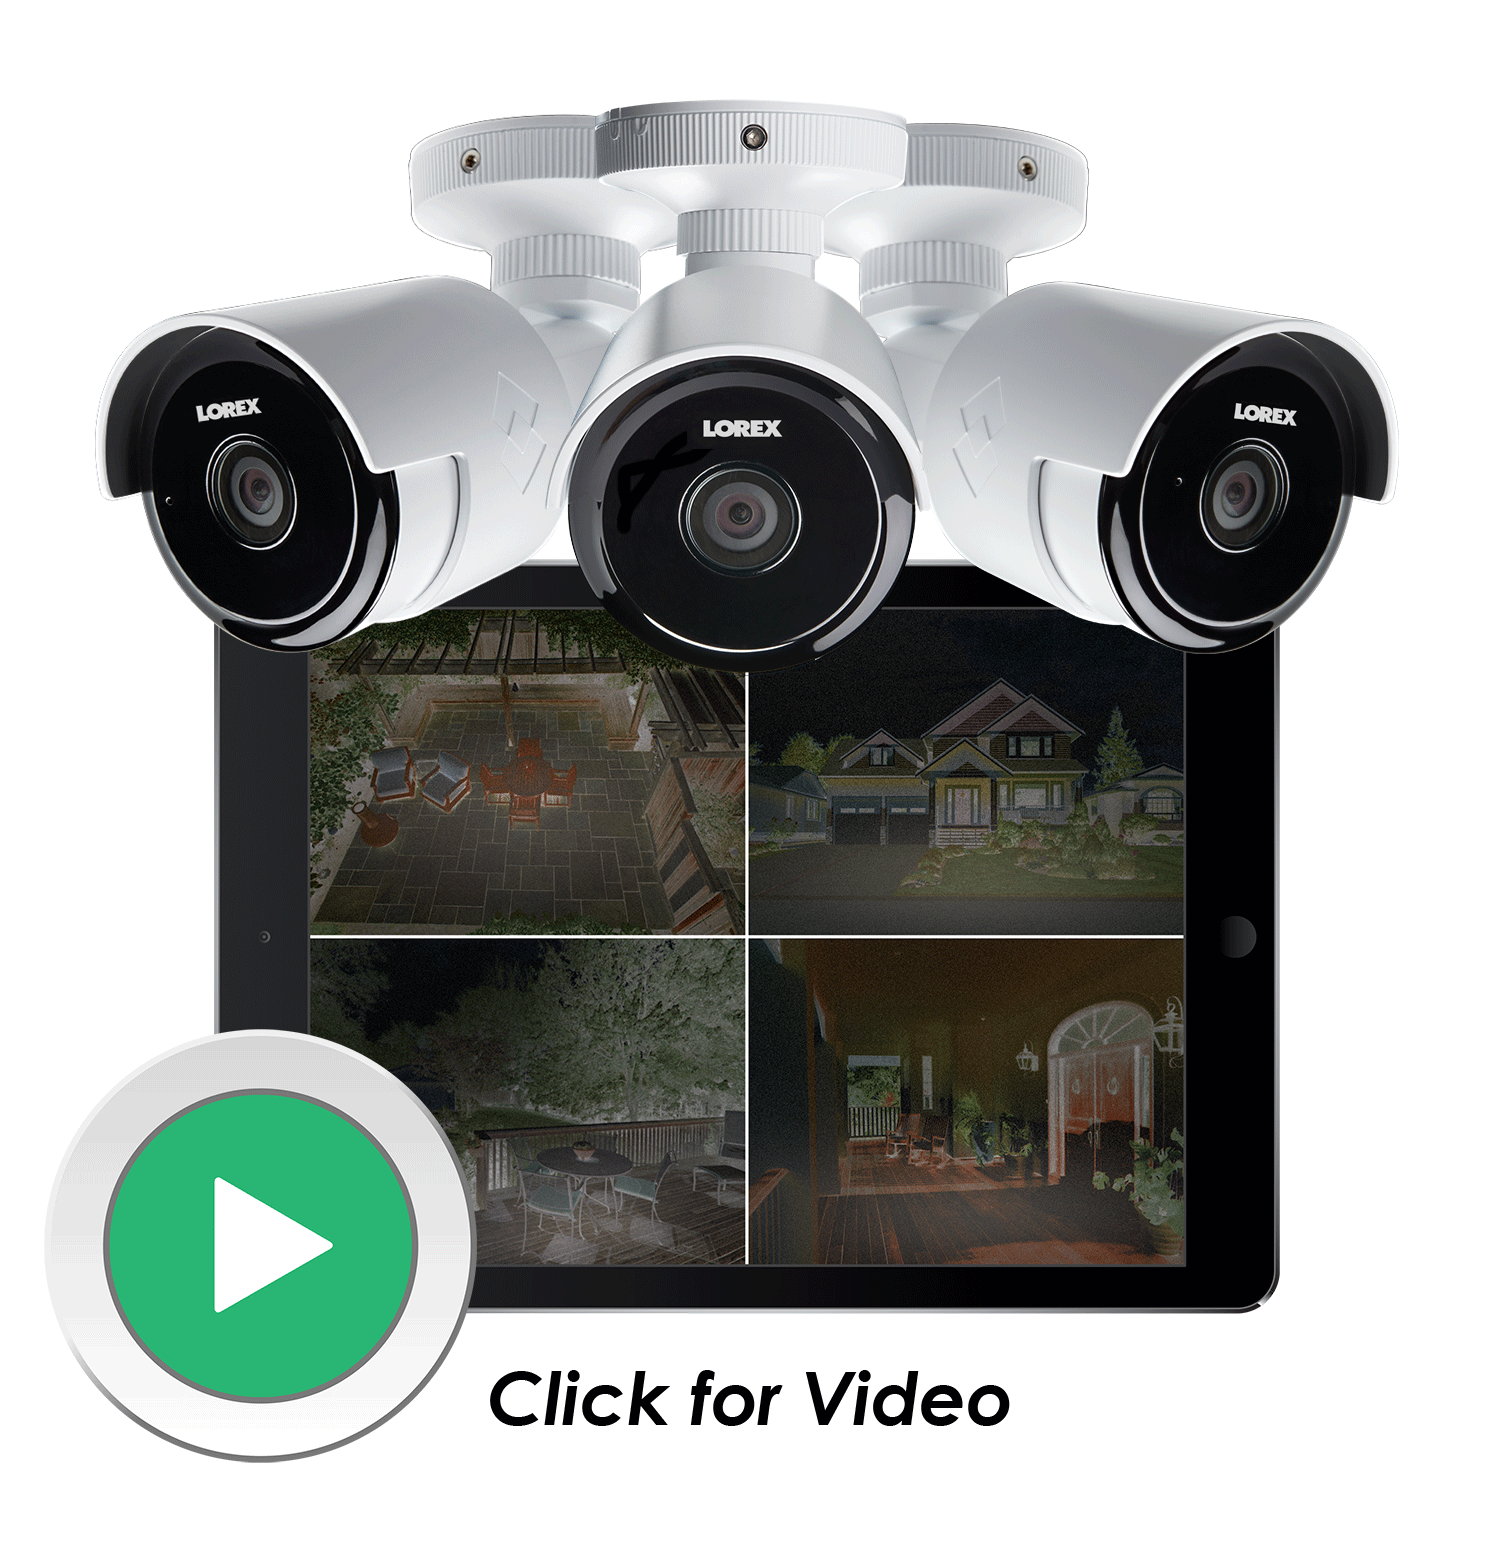 Lorex HD Outdoor Wi-Fi Security Camera | Lorex